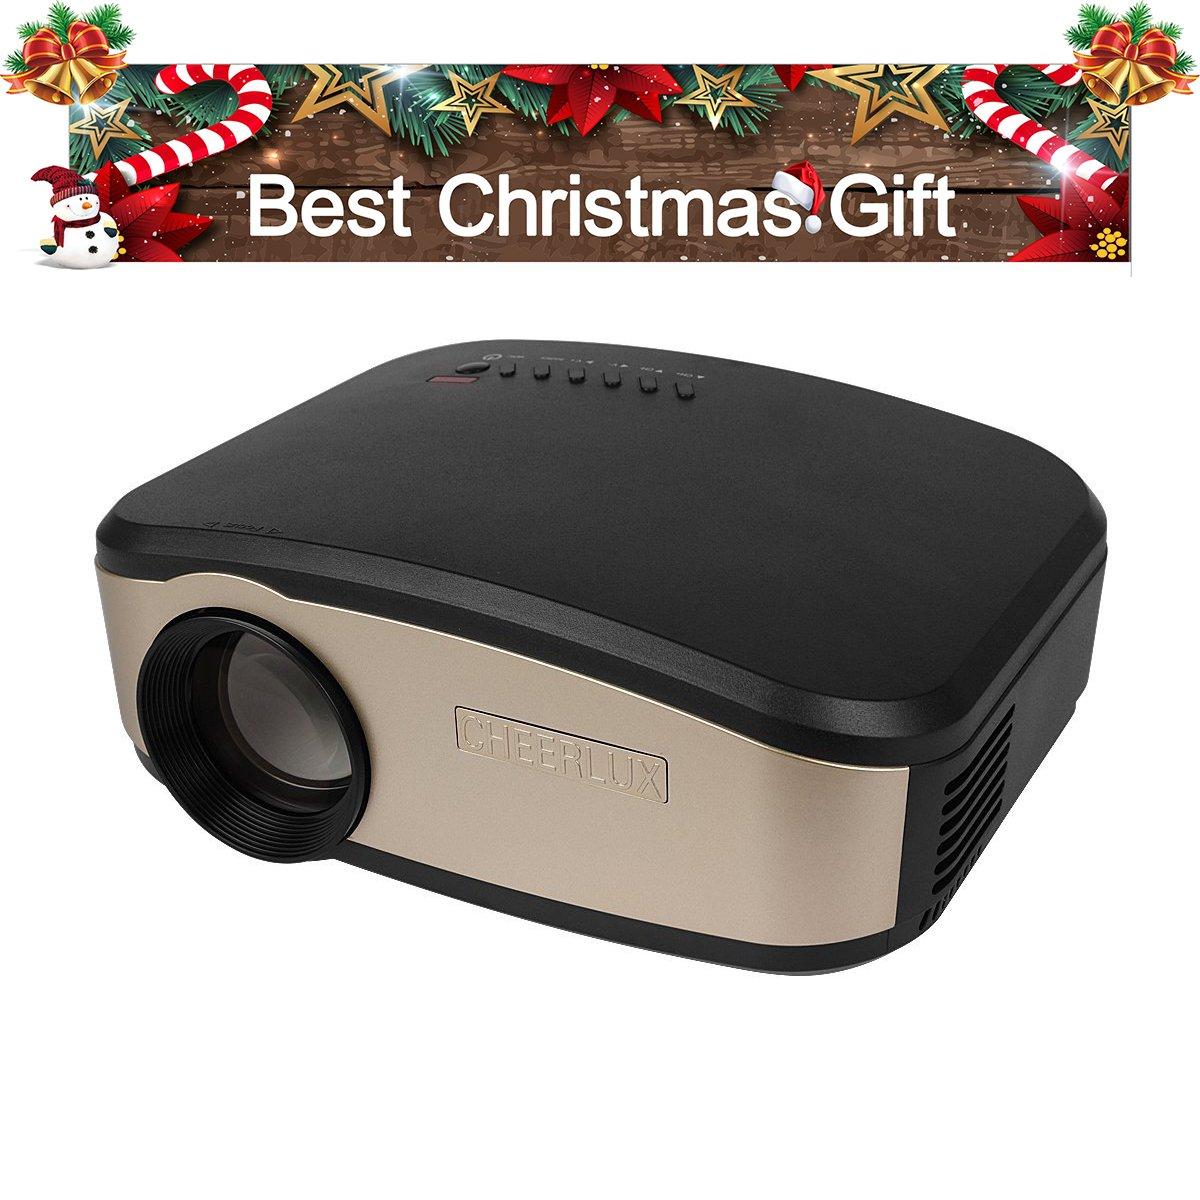 FastFox Wireless Video Proyector Projector 1000 Lumen 800x480 ...